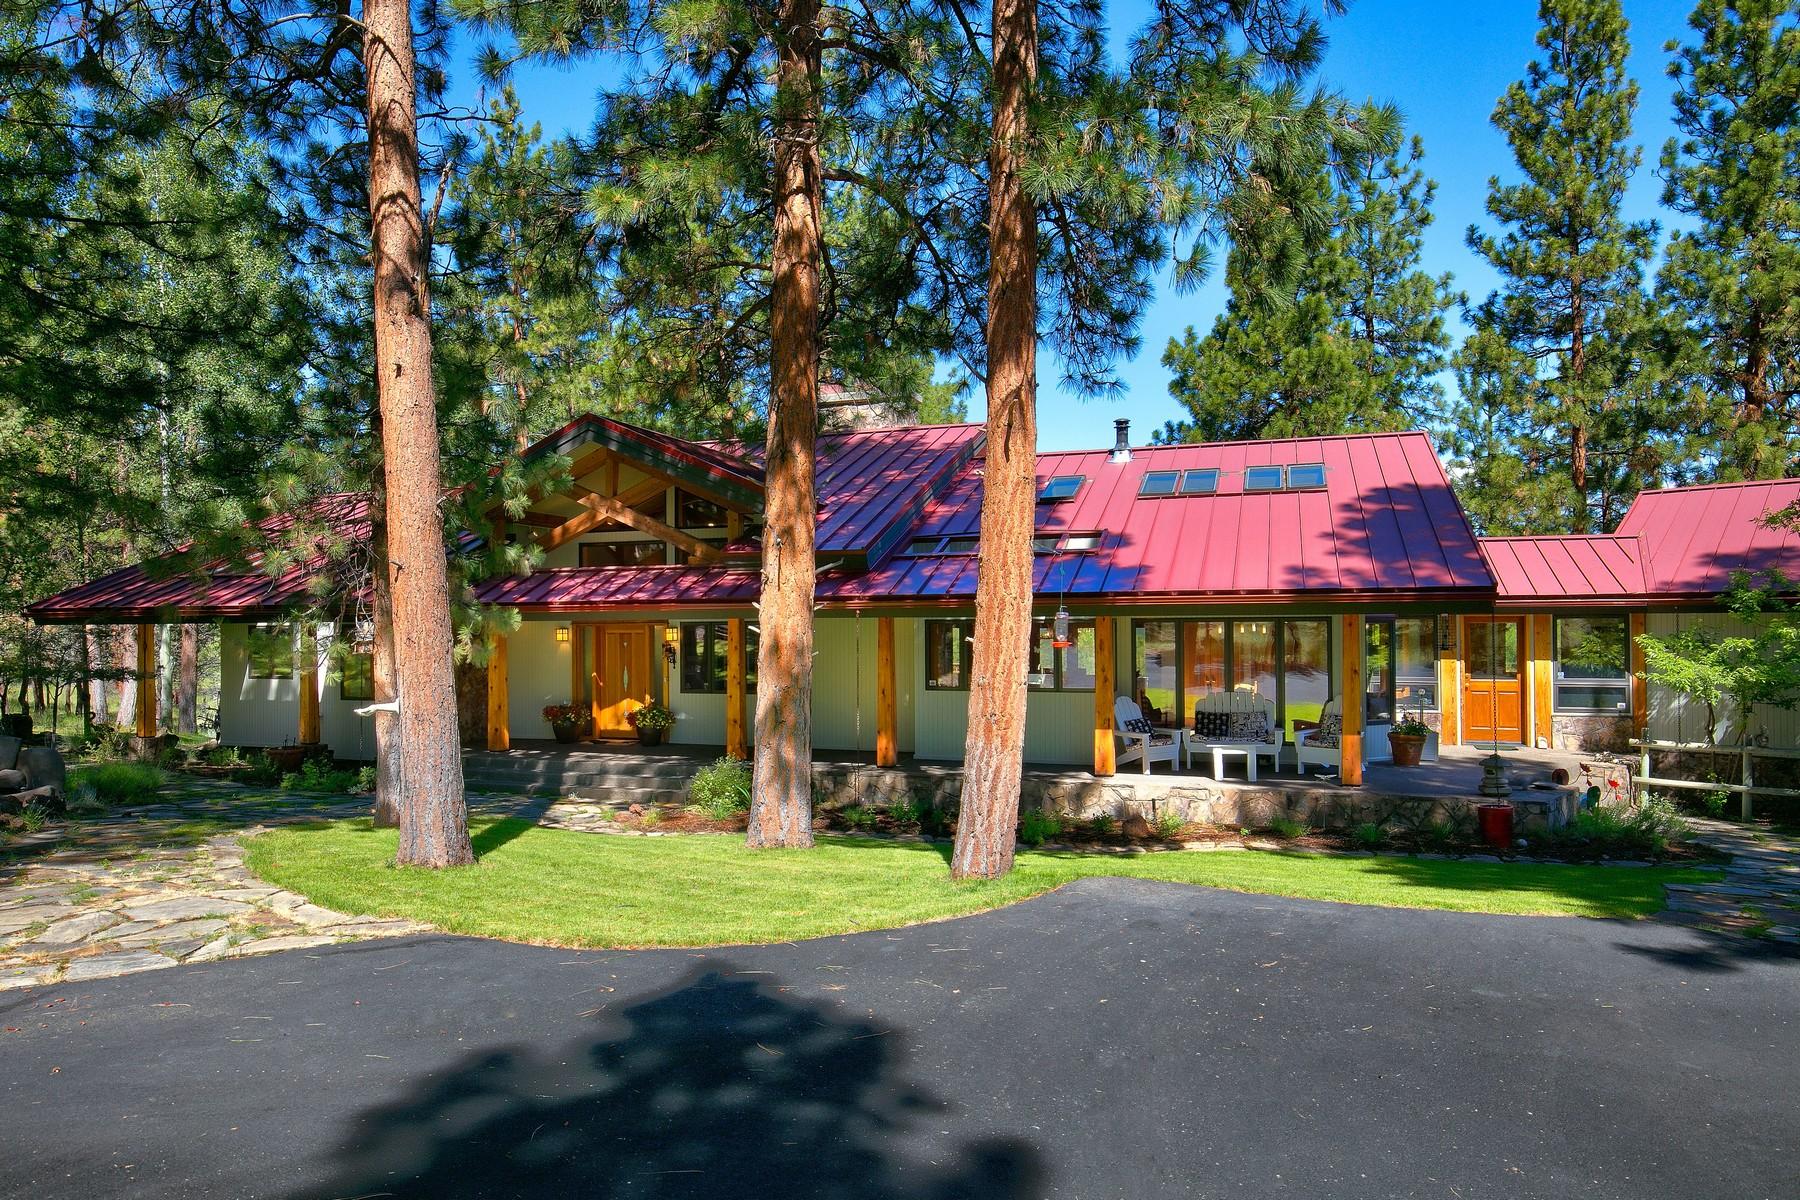 Other Residential Homes για την Πώληση στο 69027 Bay Place Sisters, OR 97759 Sisters, Ορεγκον 97759 Ηνωμένες Πολιτείες